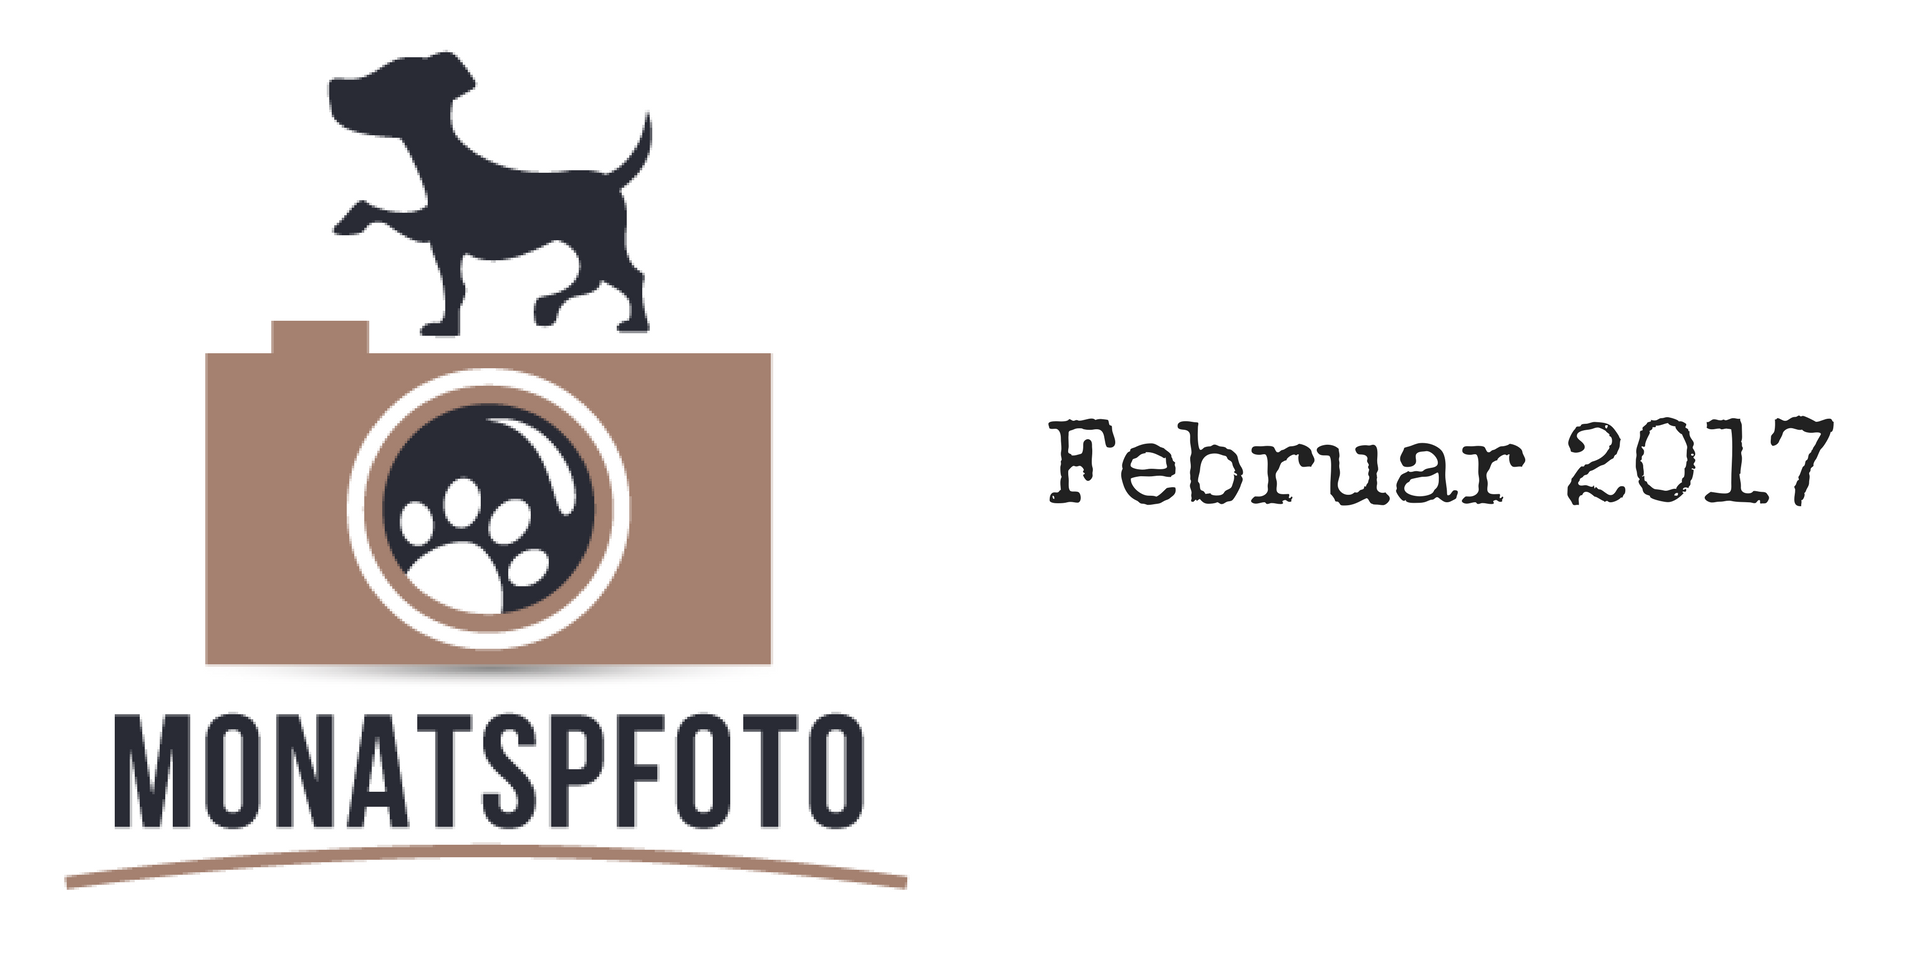 Monatspfoto Februar 2017 miDoggy Blog Community für Hunde